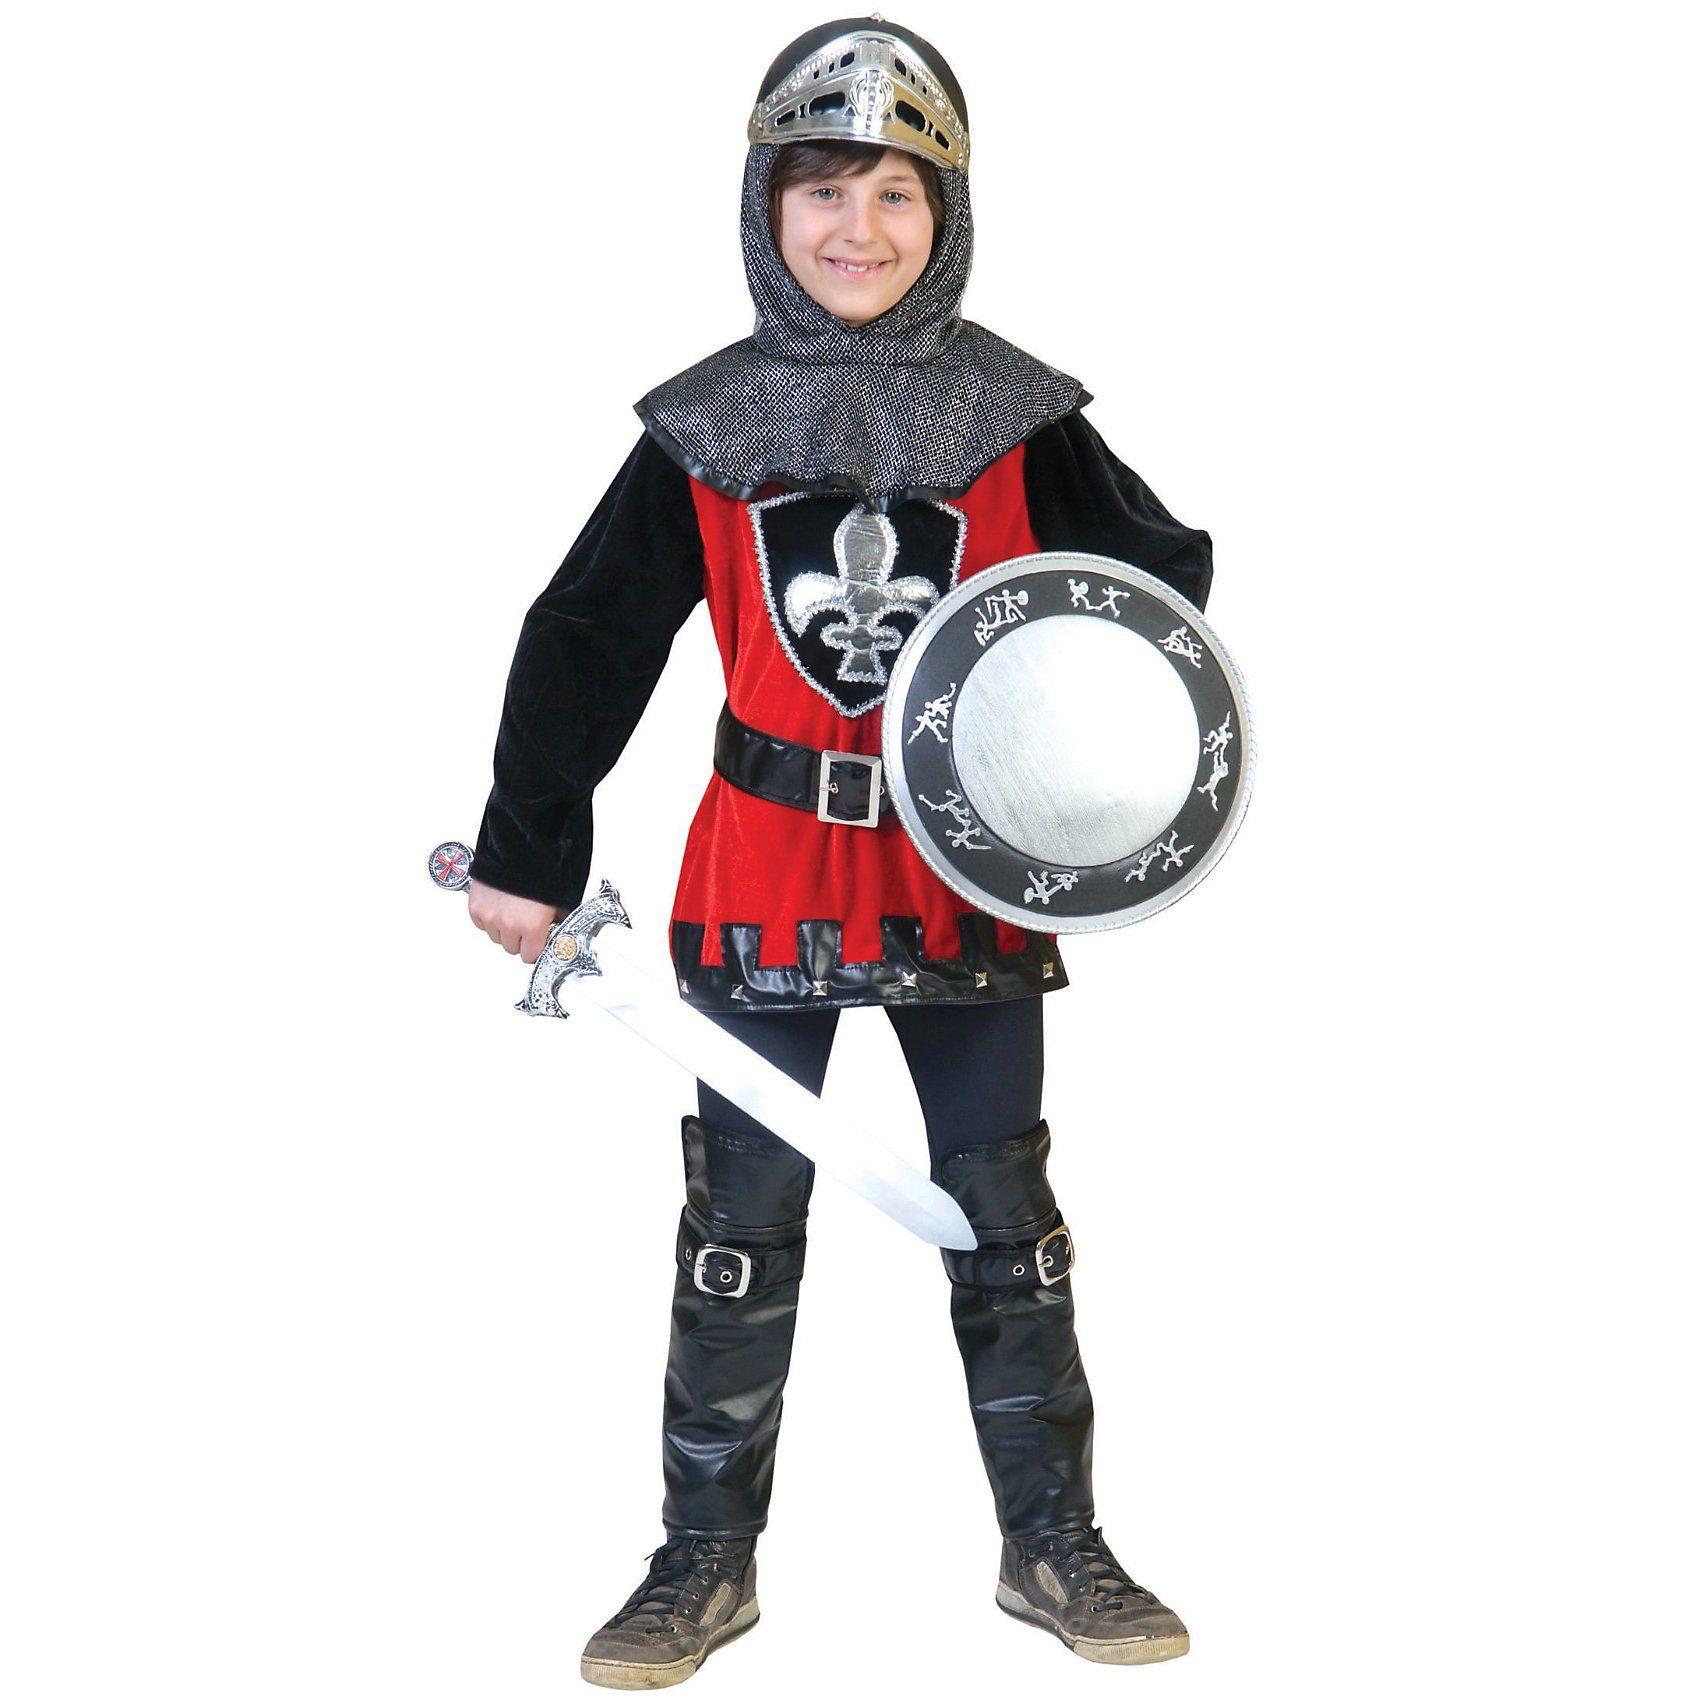 Funny Fashion Kostüm schwarzroter Ritter Anselm, 2-tlg.